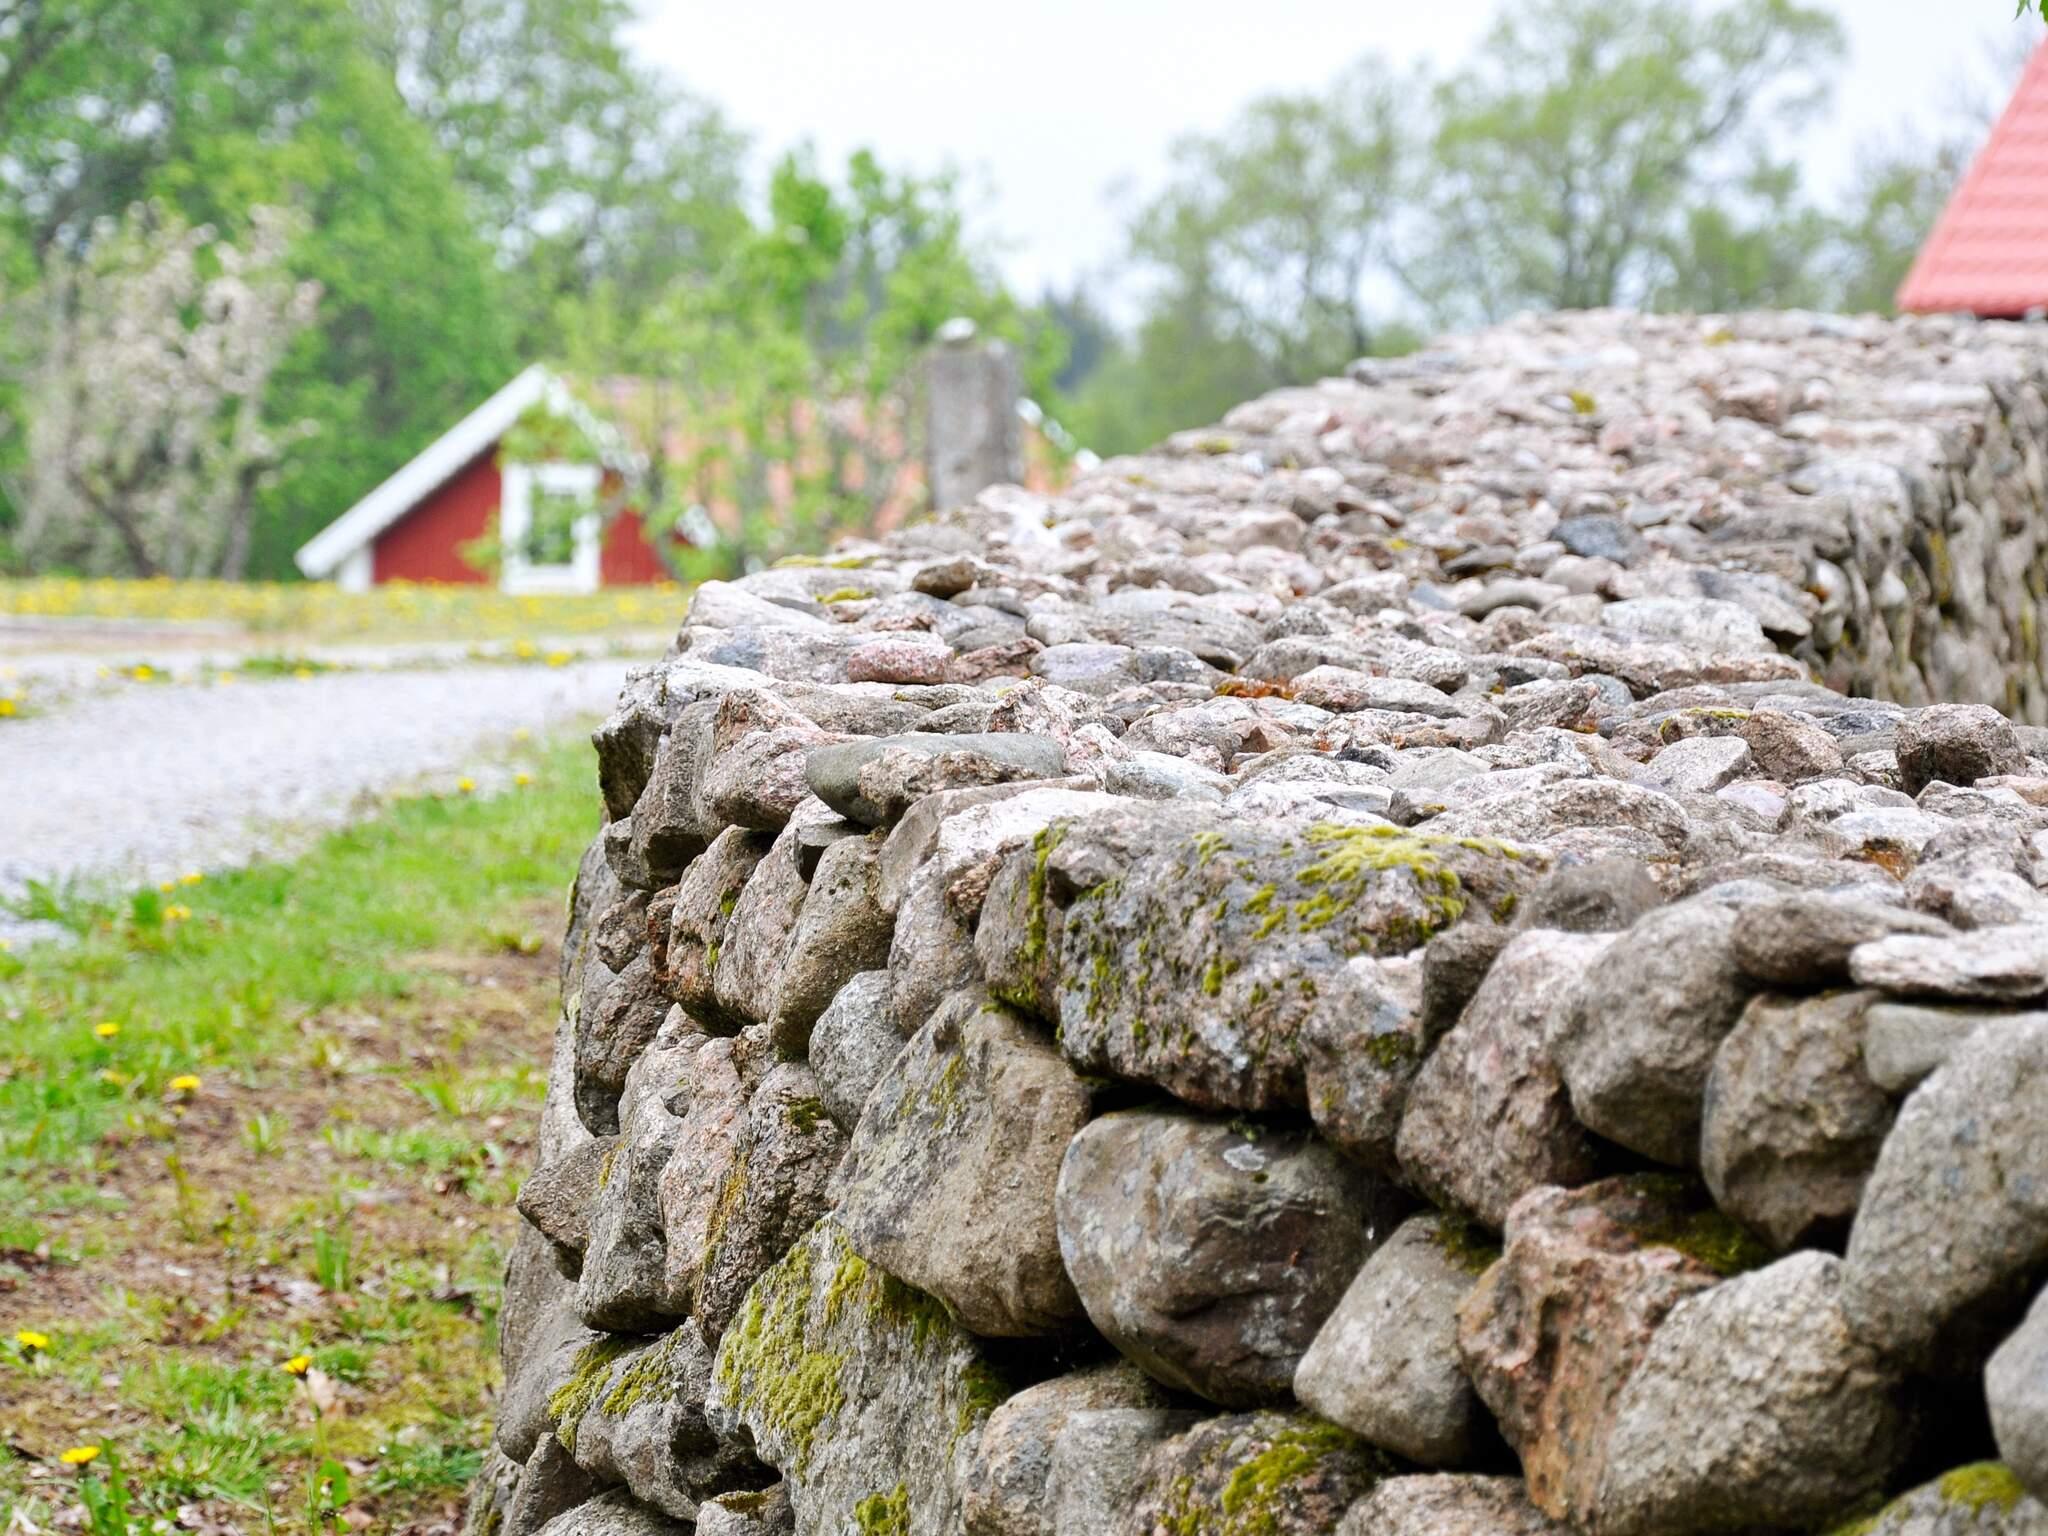 Ferienhaus Karlskrona (2624317), Eringsboda, Blekinge län, Südschweden, Schweden, Bild 16